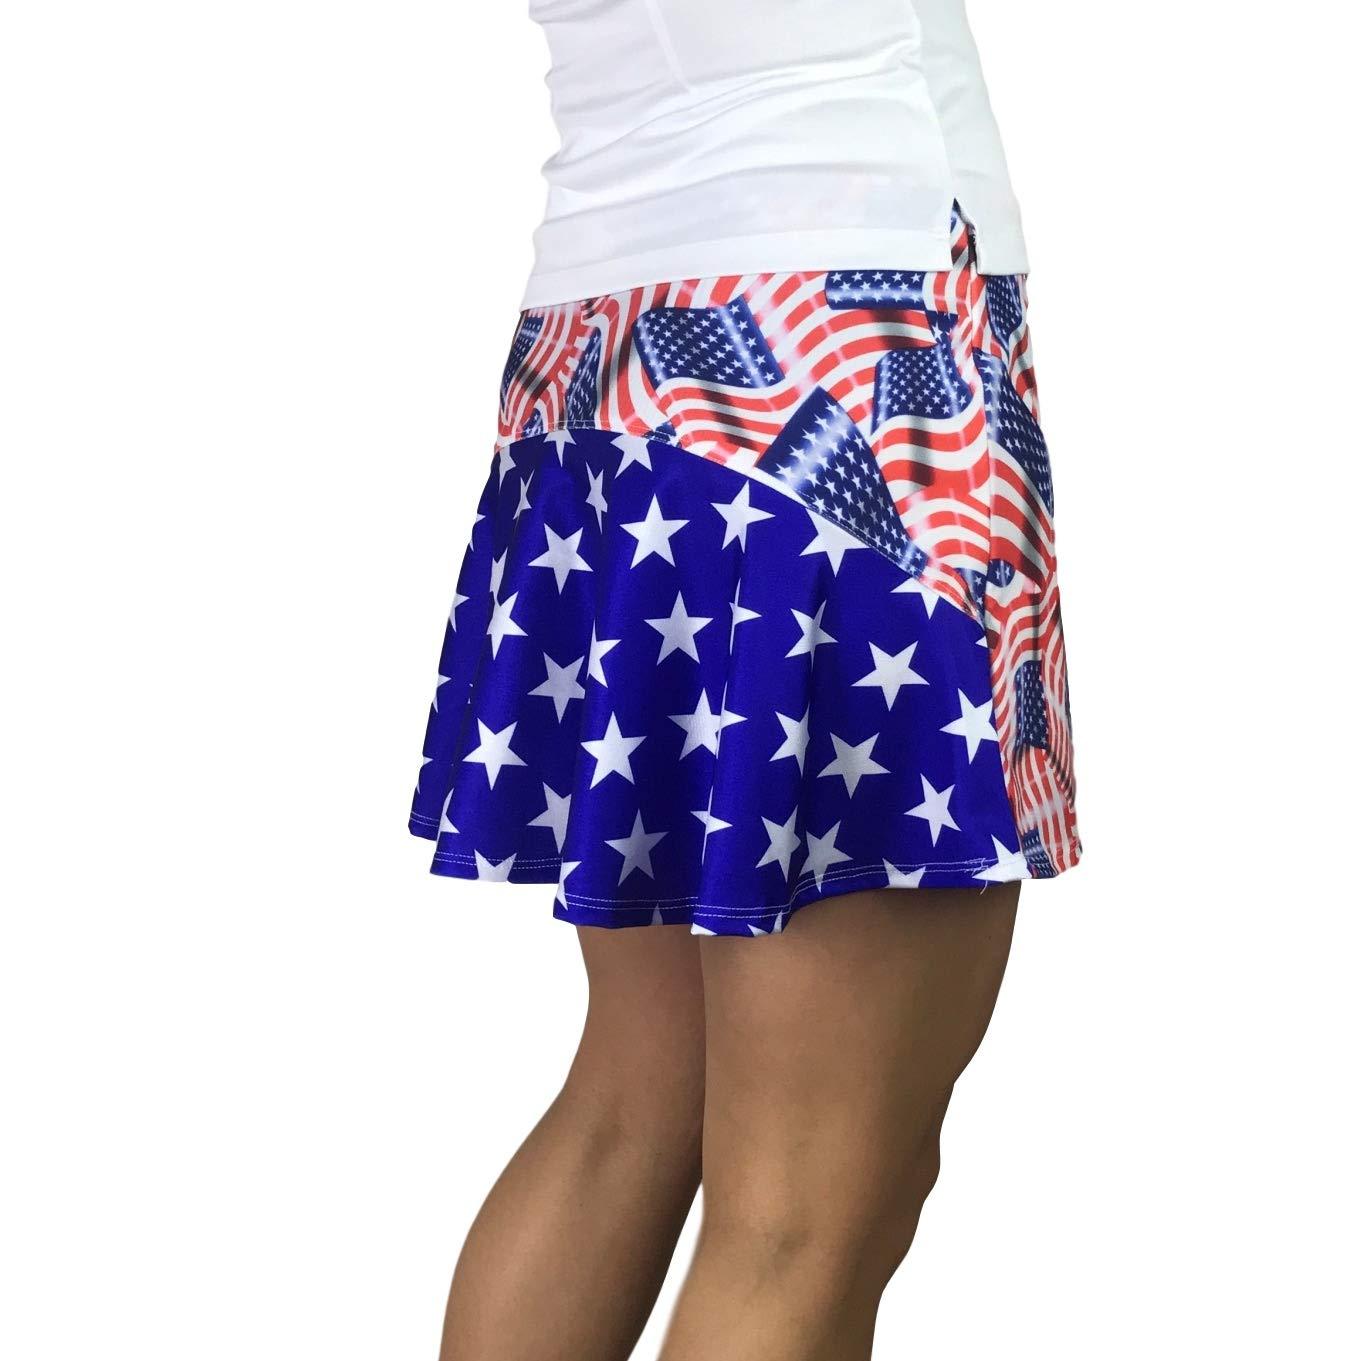 Smash Dandy American Flag Flutter Style Golf/Tennis Skort/Skirt (XSmall) by Smash Dandy